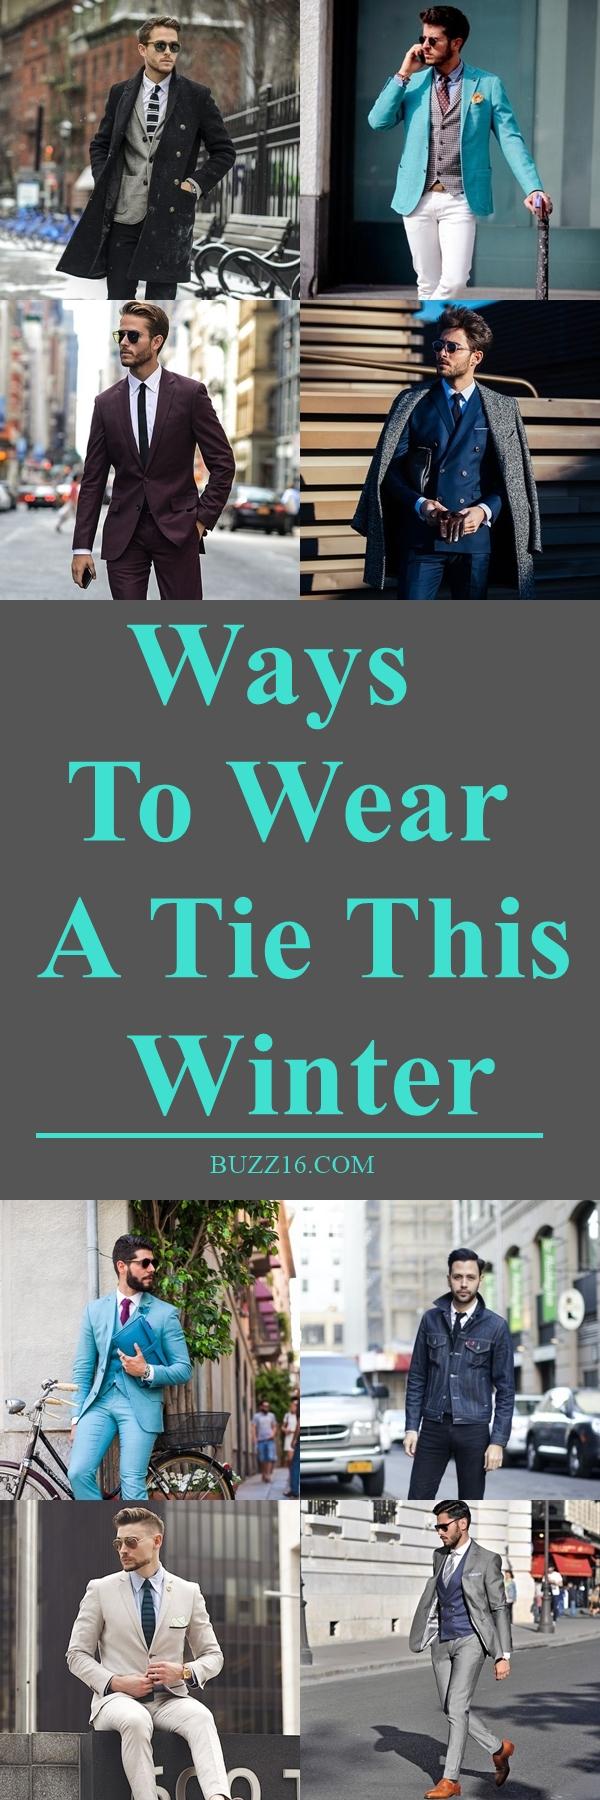 40 Ways to Wear a Tie This Winter